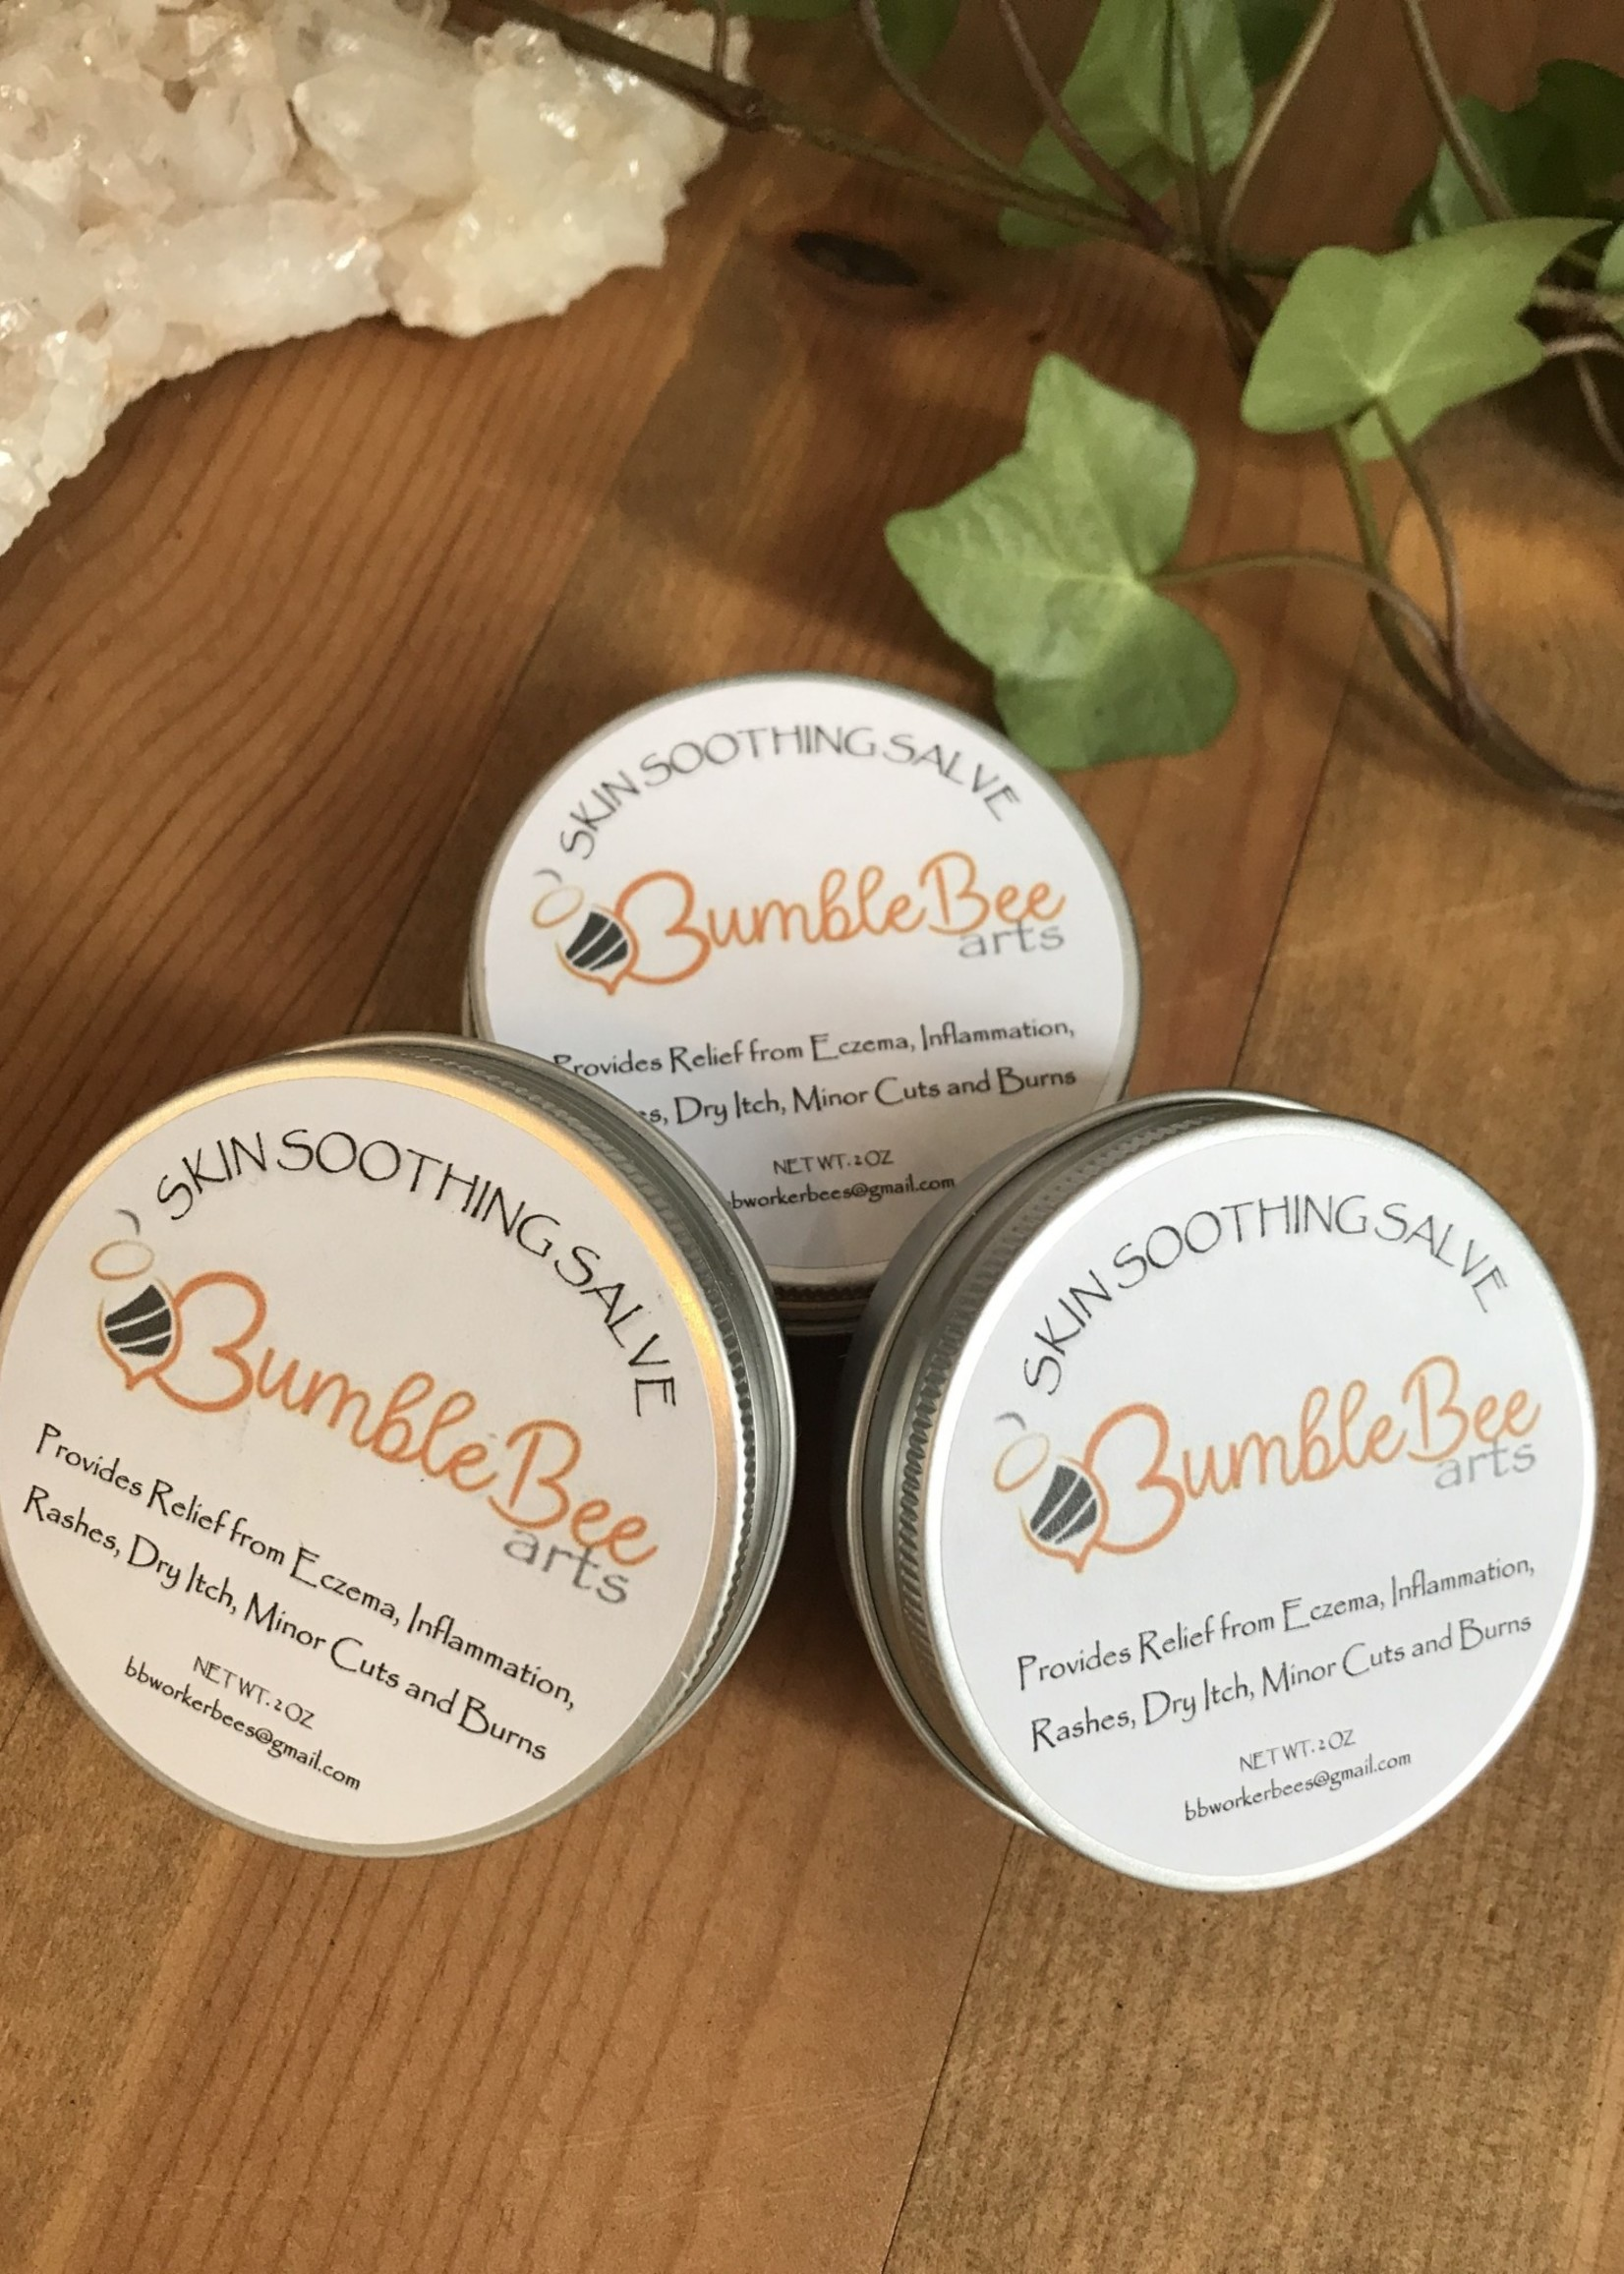 BumbleBee Arts Skin Soothing Salve - Bumble Bee Arts